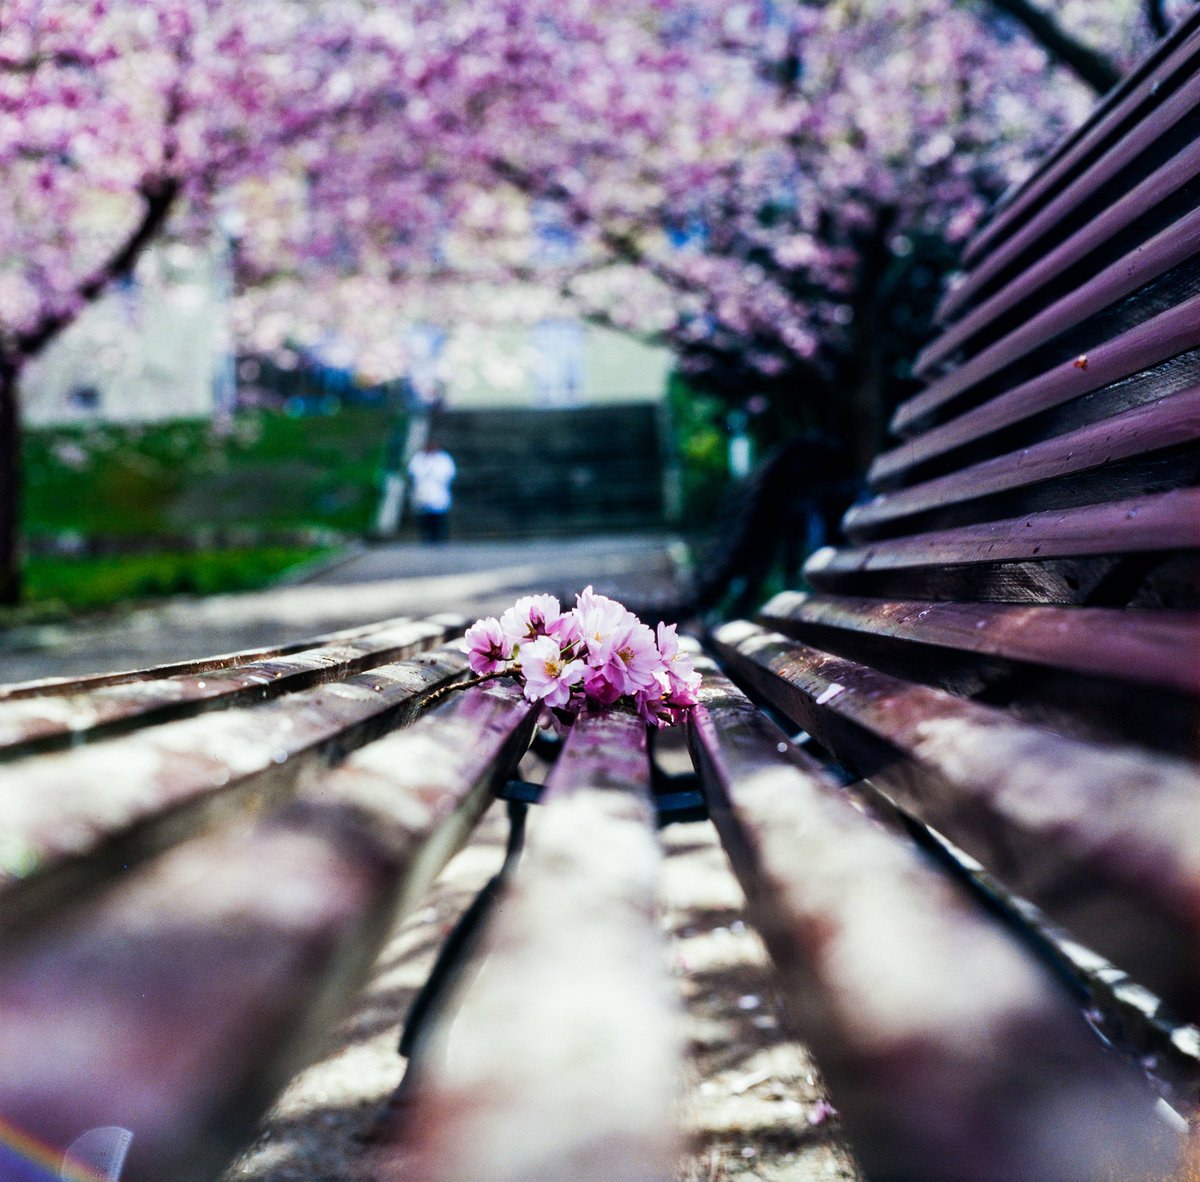 Sakura moment: Kodak ektachrome lumiere 100, rolleicord III @EMULSIVEfilm @KodakProFilmBiz  @jonasx70 #believeinfilm https://t.co/sRJjgLj0uQ